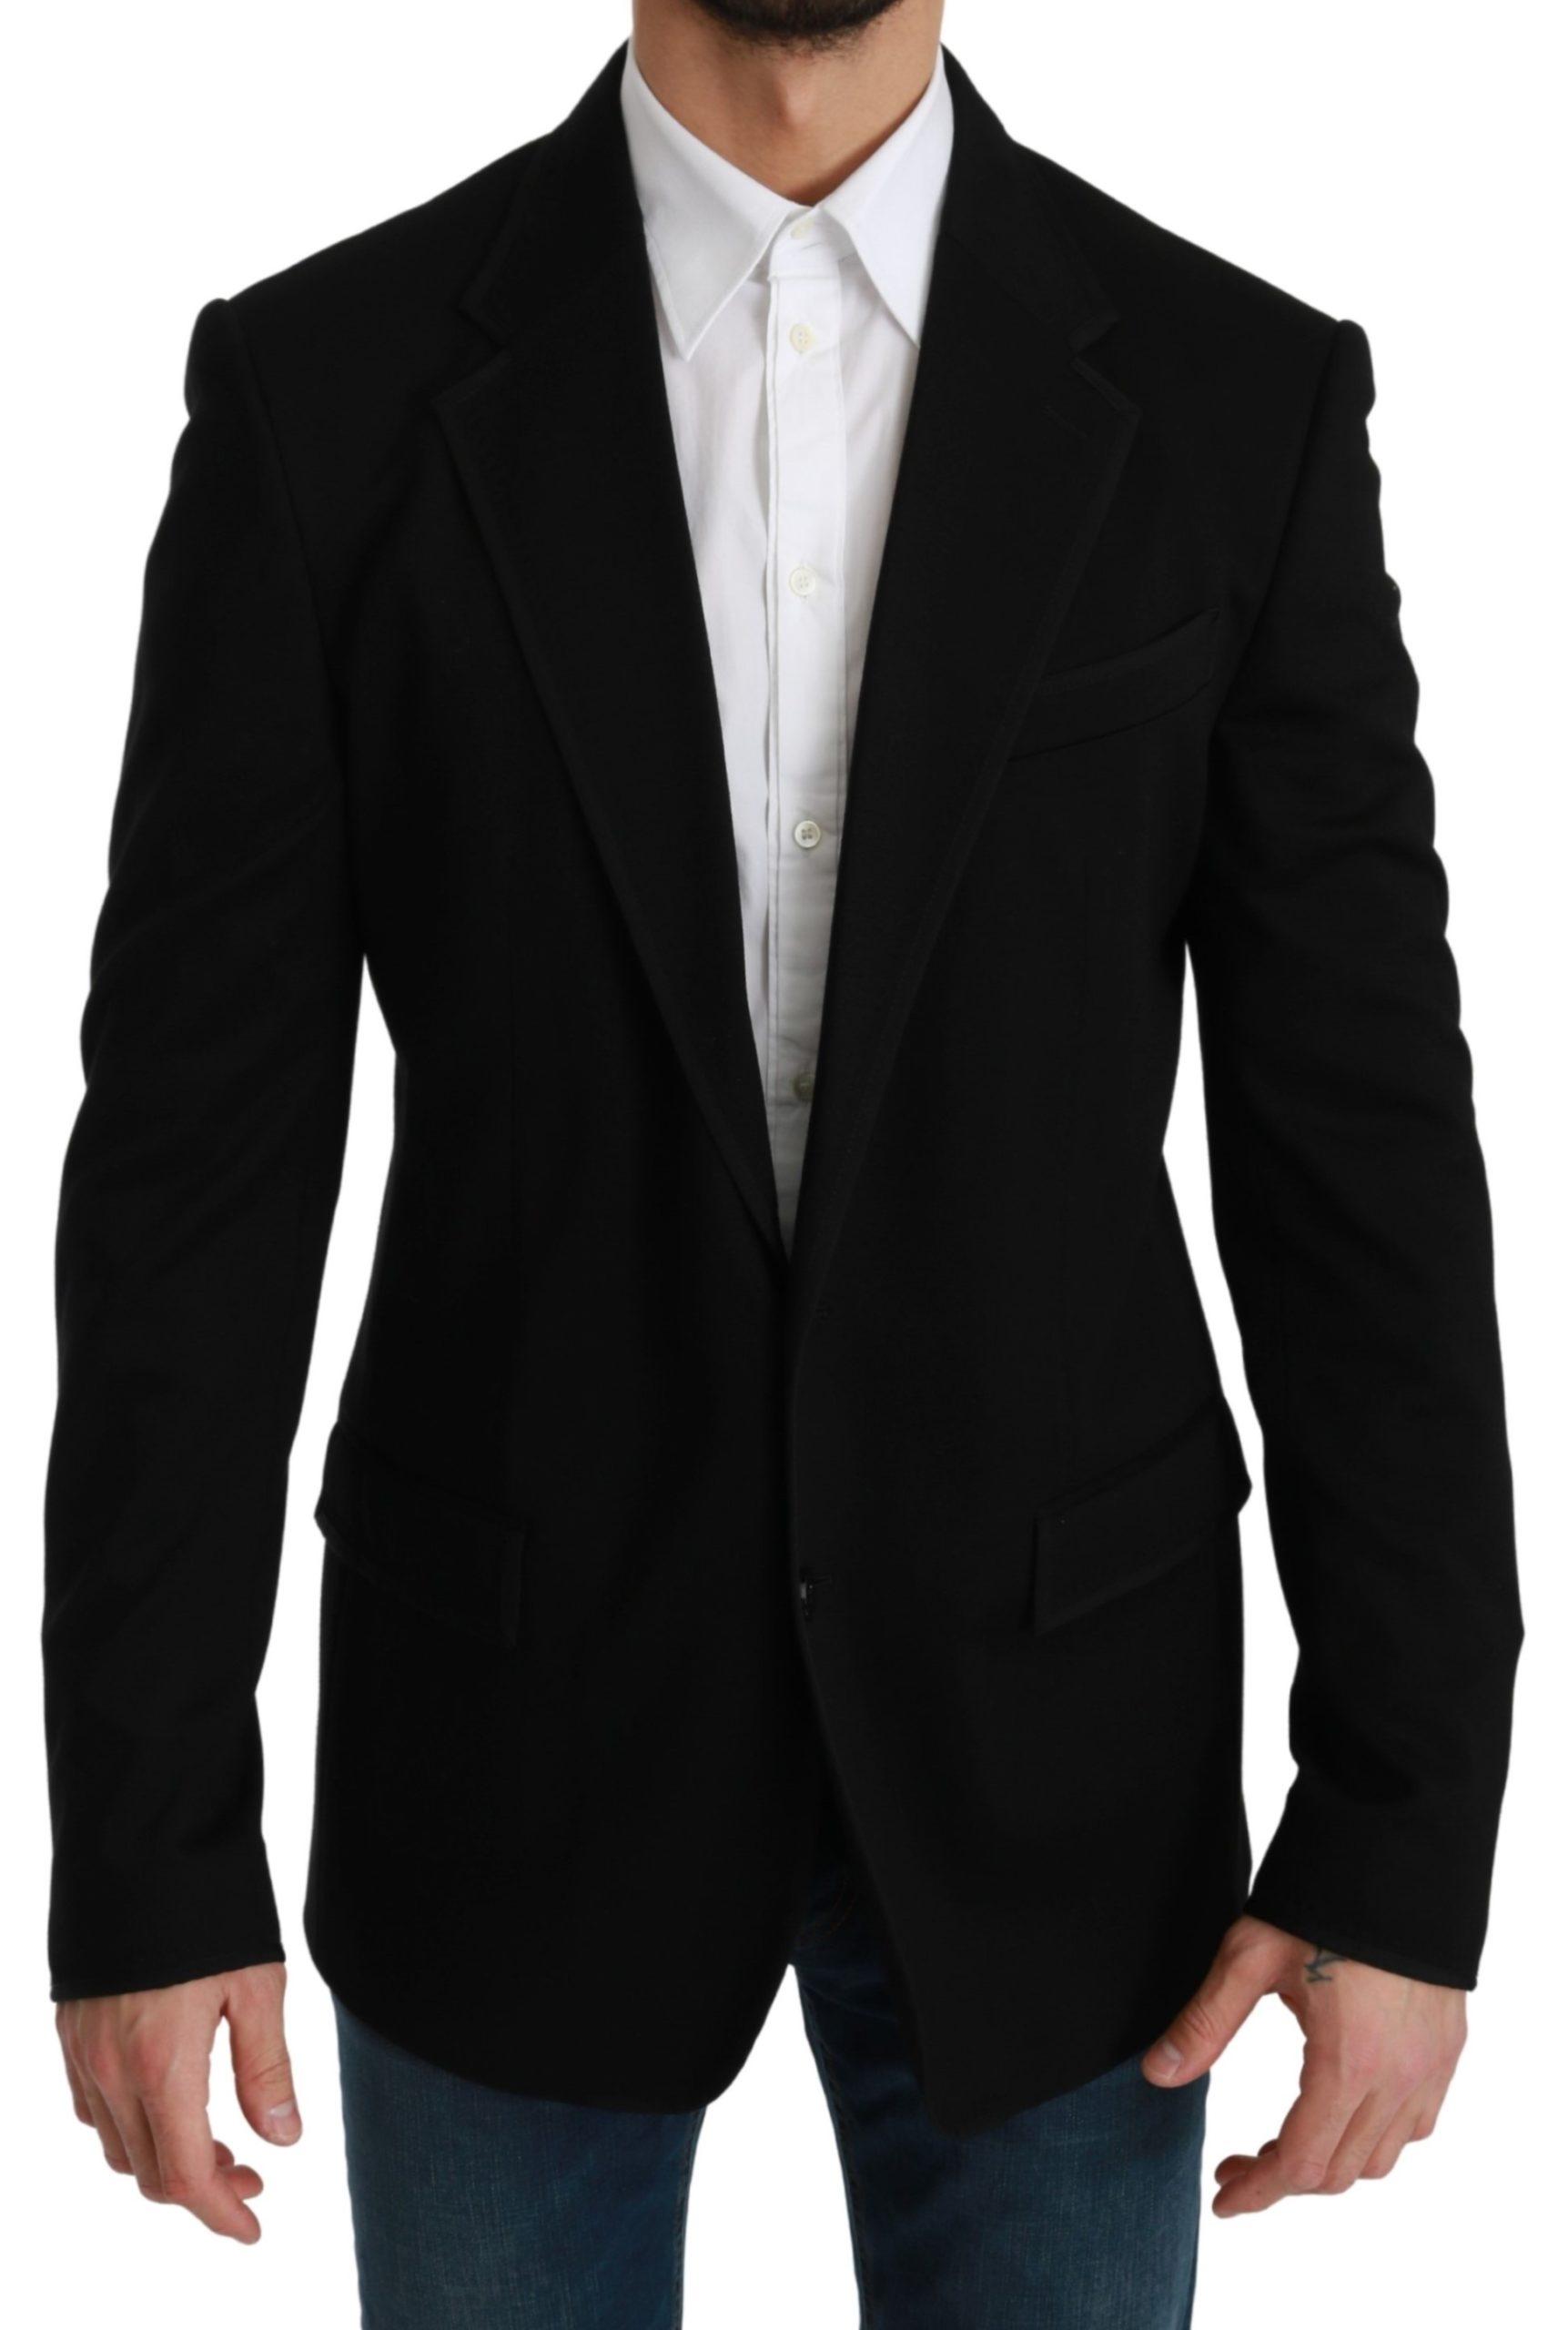 Dolce & Gabbana Men's Formal Slim Fit Blazer Black KOS1759 - IT52 | L